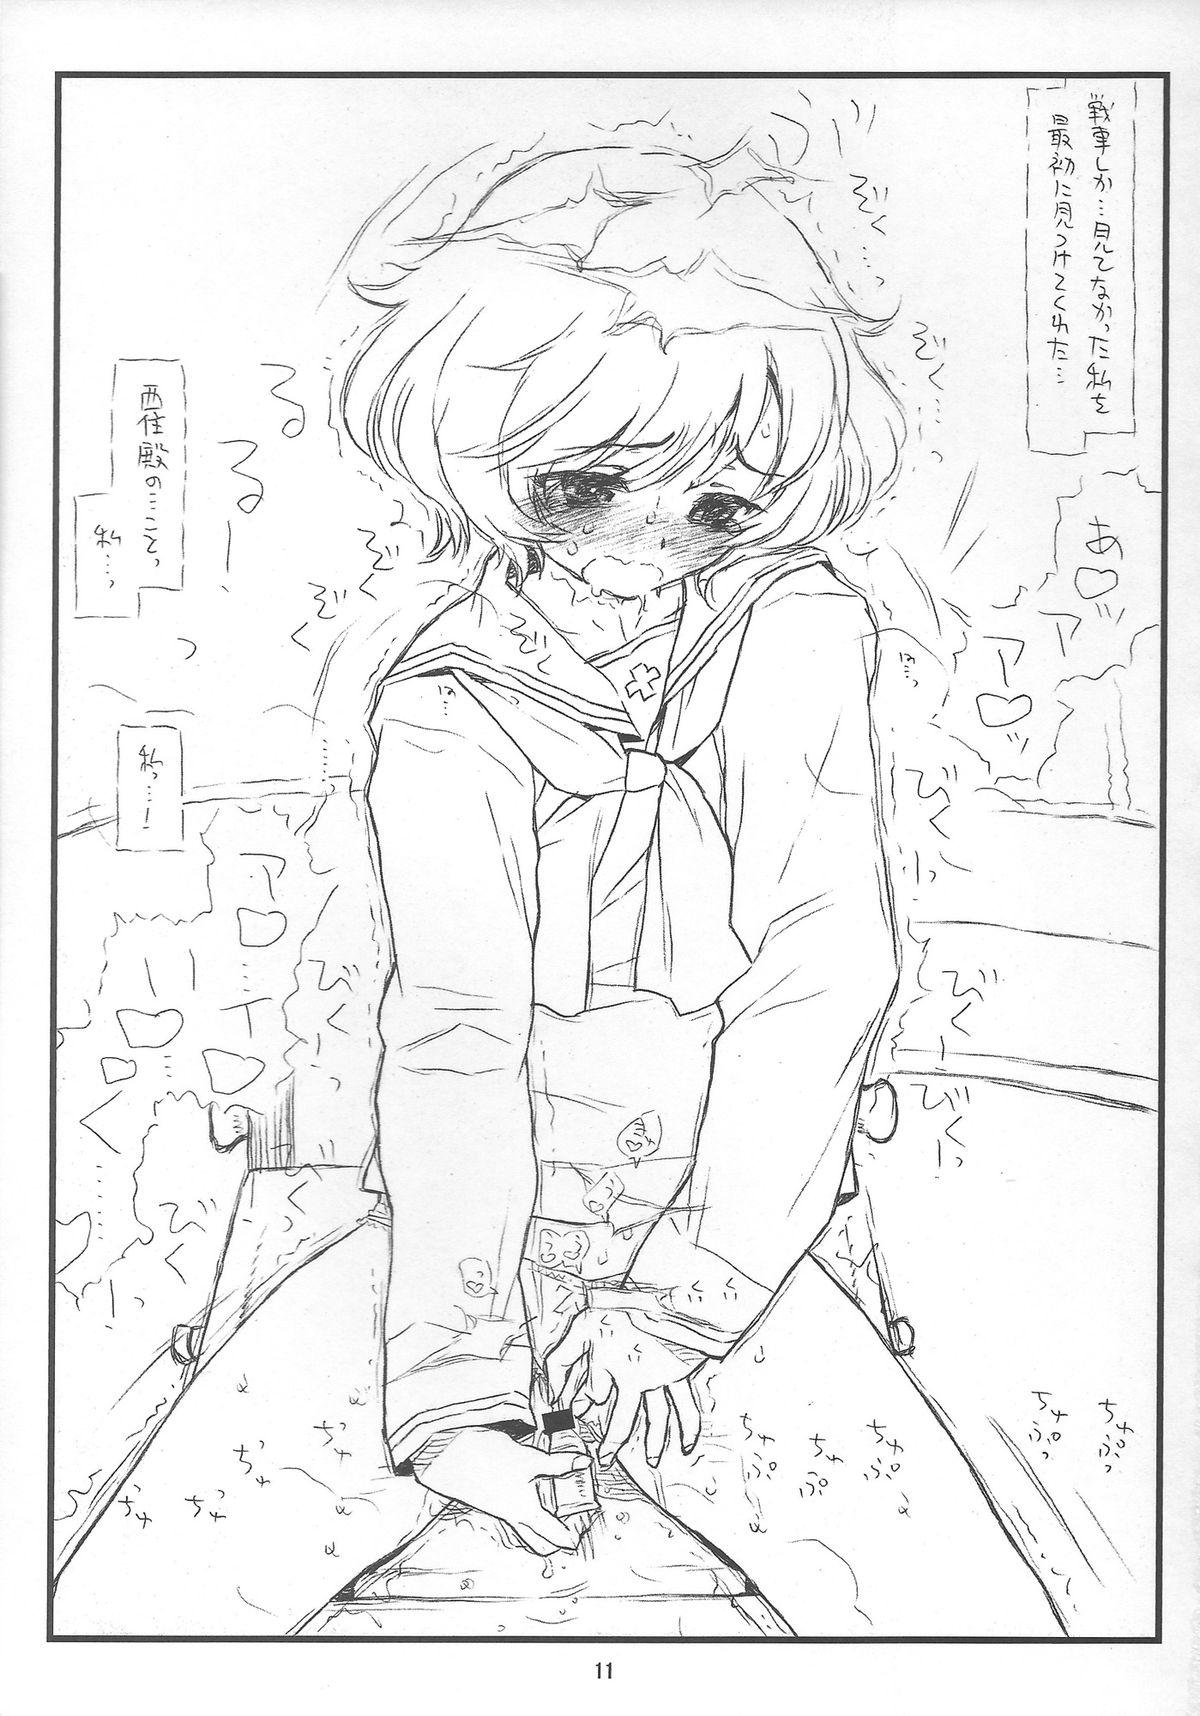 (C84) [bolze.] 「Honanie + Akiyama-dono Sennyudaisakusen (Sippai)」 (Girls und Panzer) 10